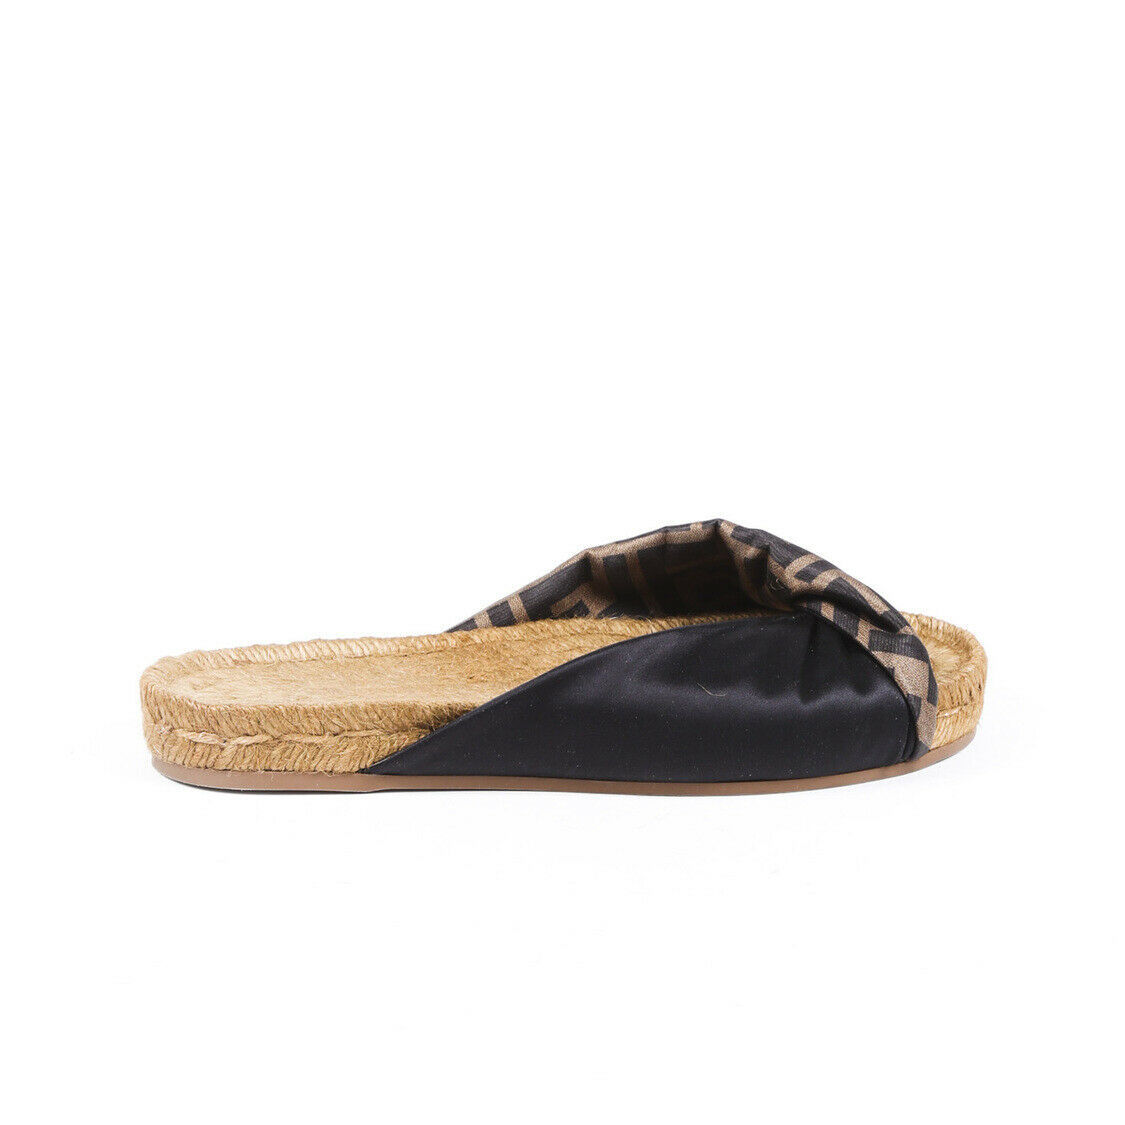 Fendi Zucca Satin Espadrille Slide Sandals SZ 37 - $310.00